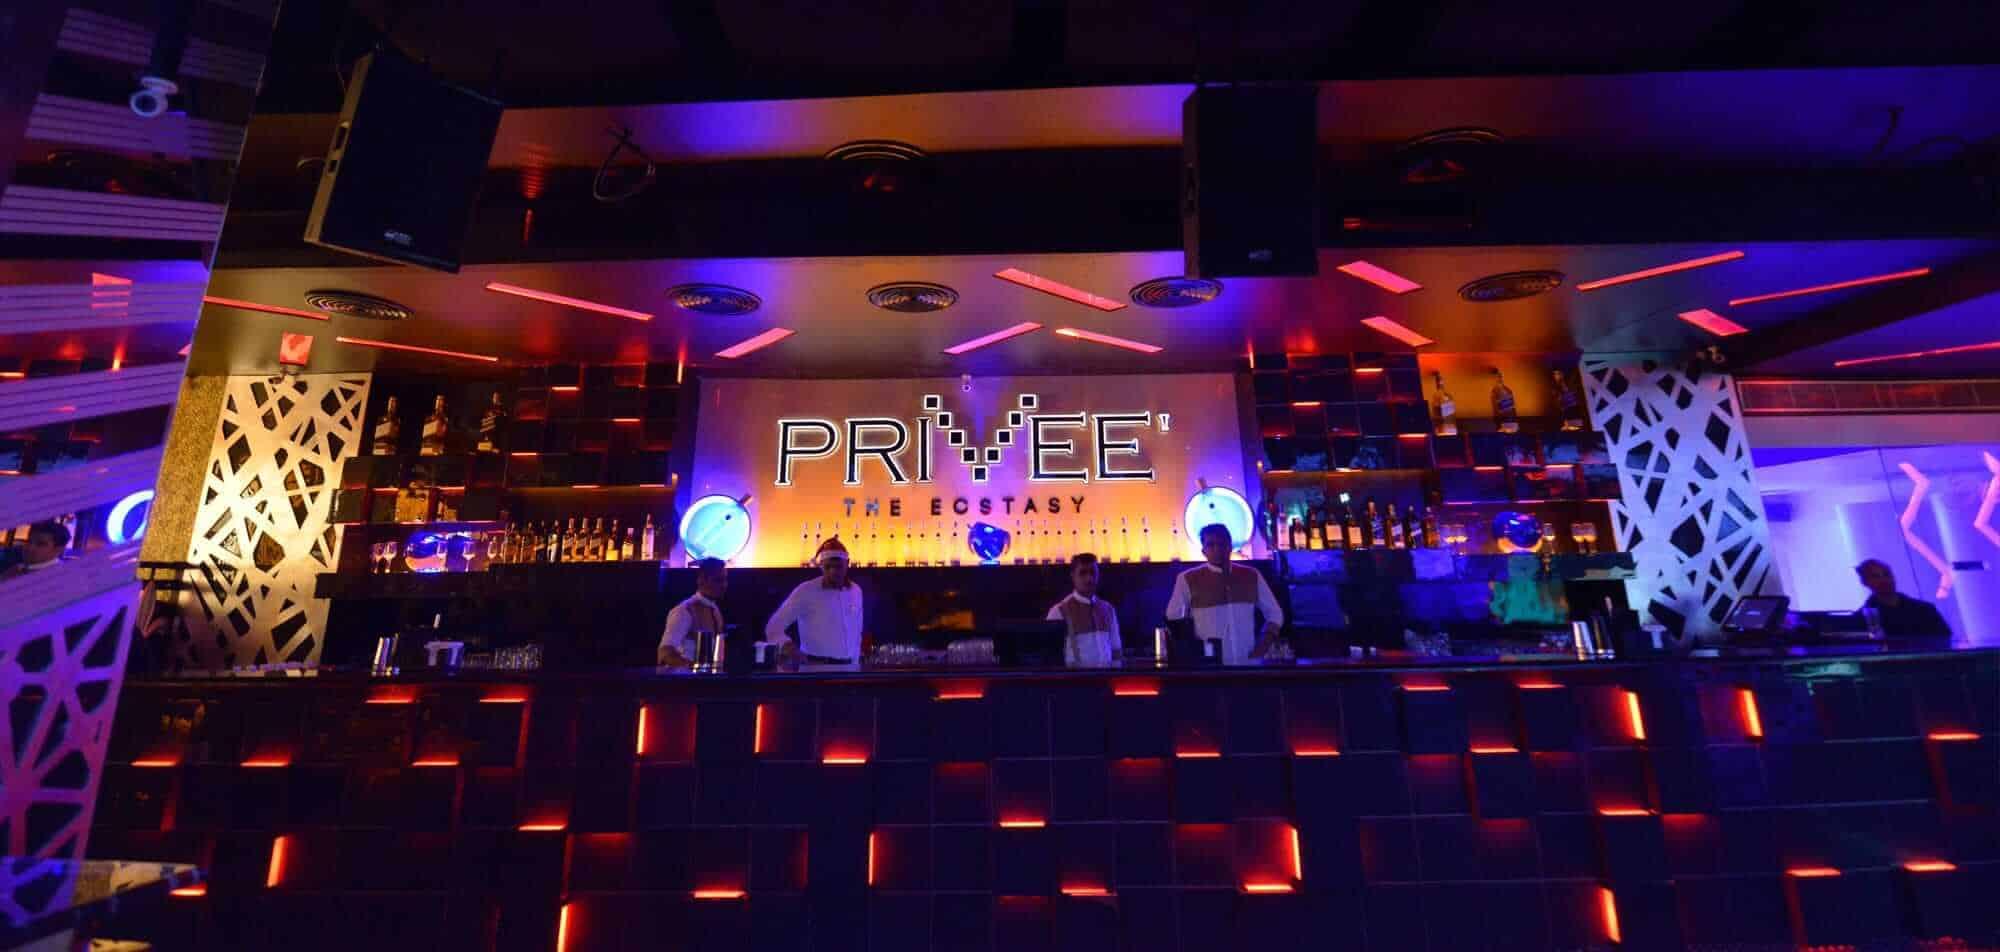 Privee, New Delhi, India